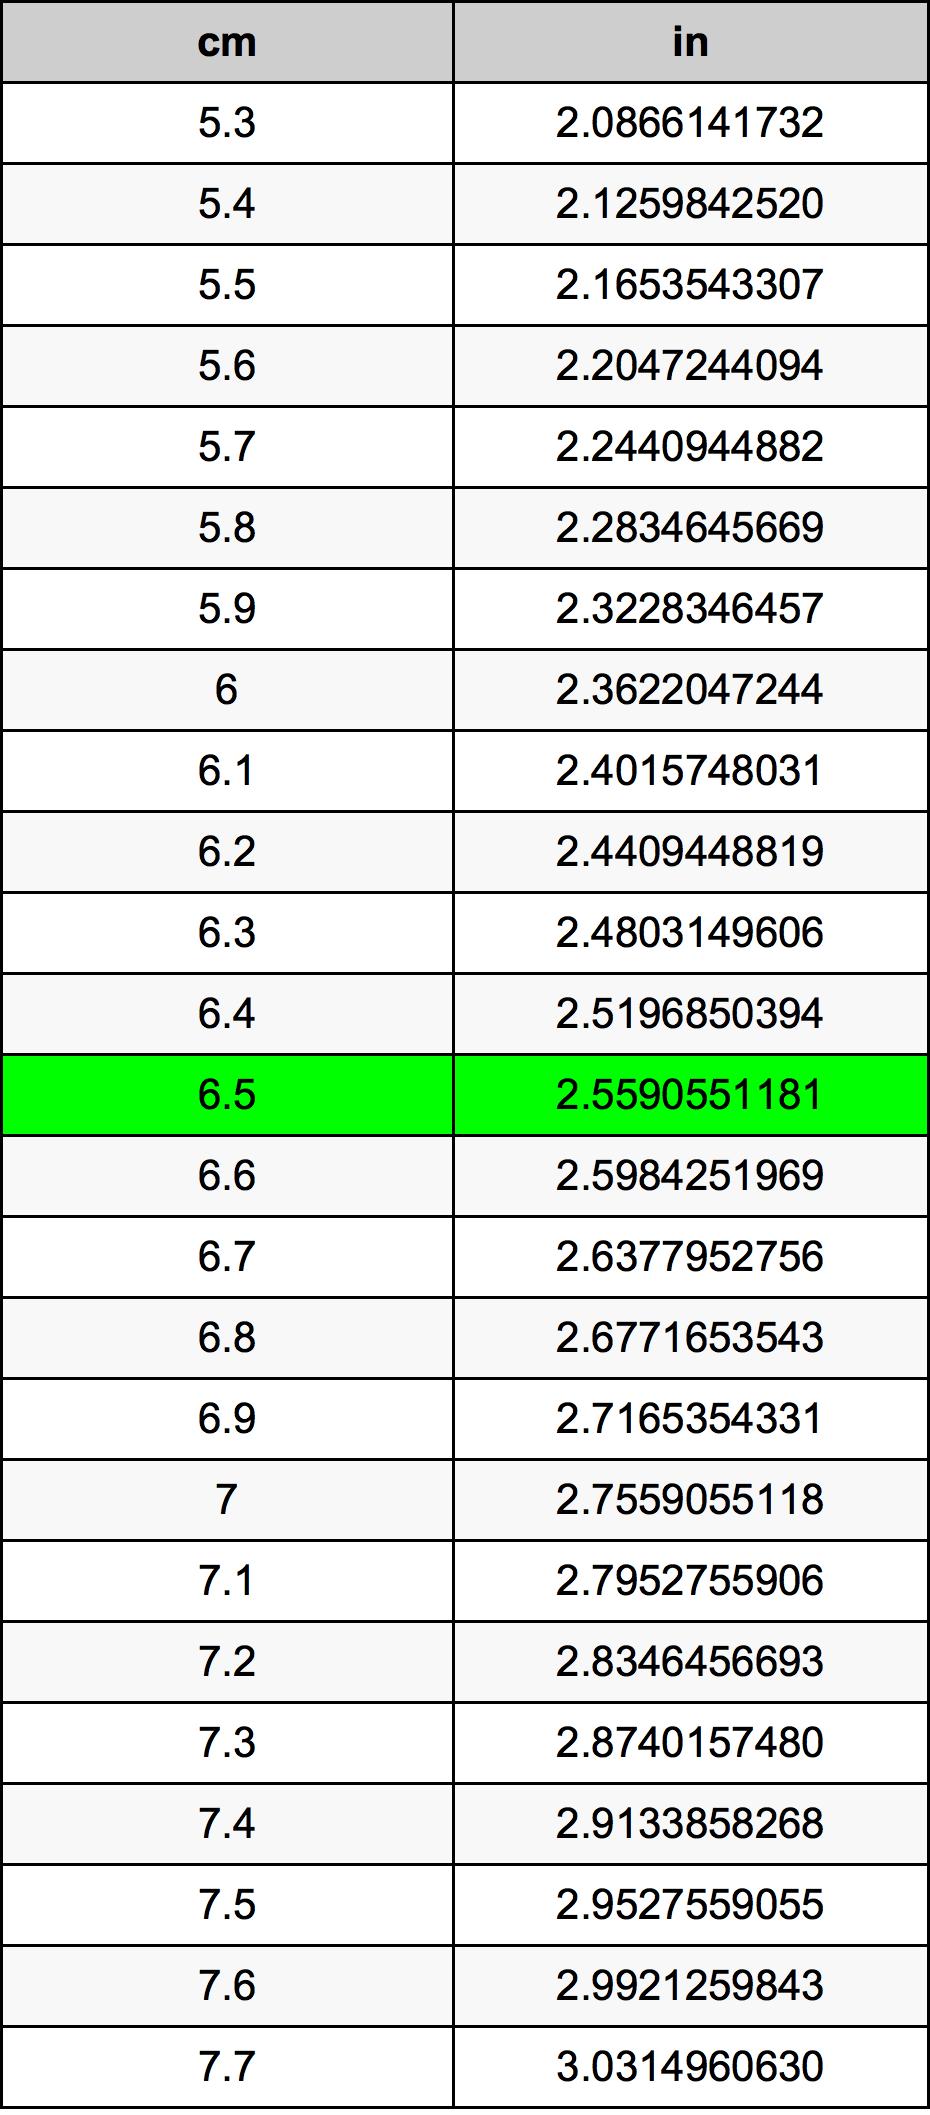 6.5 Centímetro Tabla de conversión